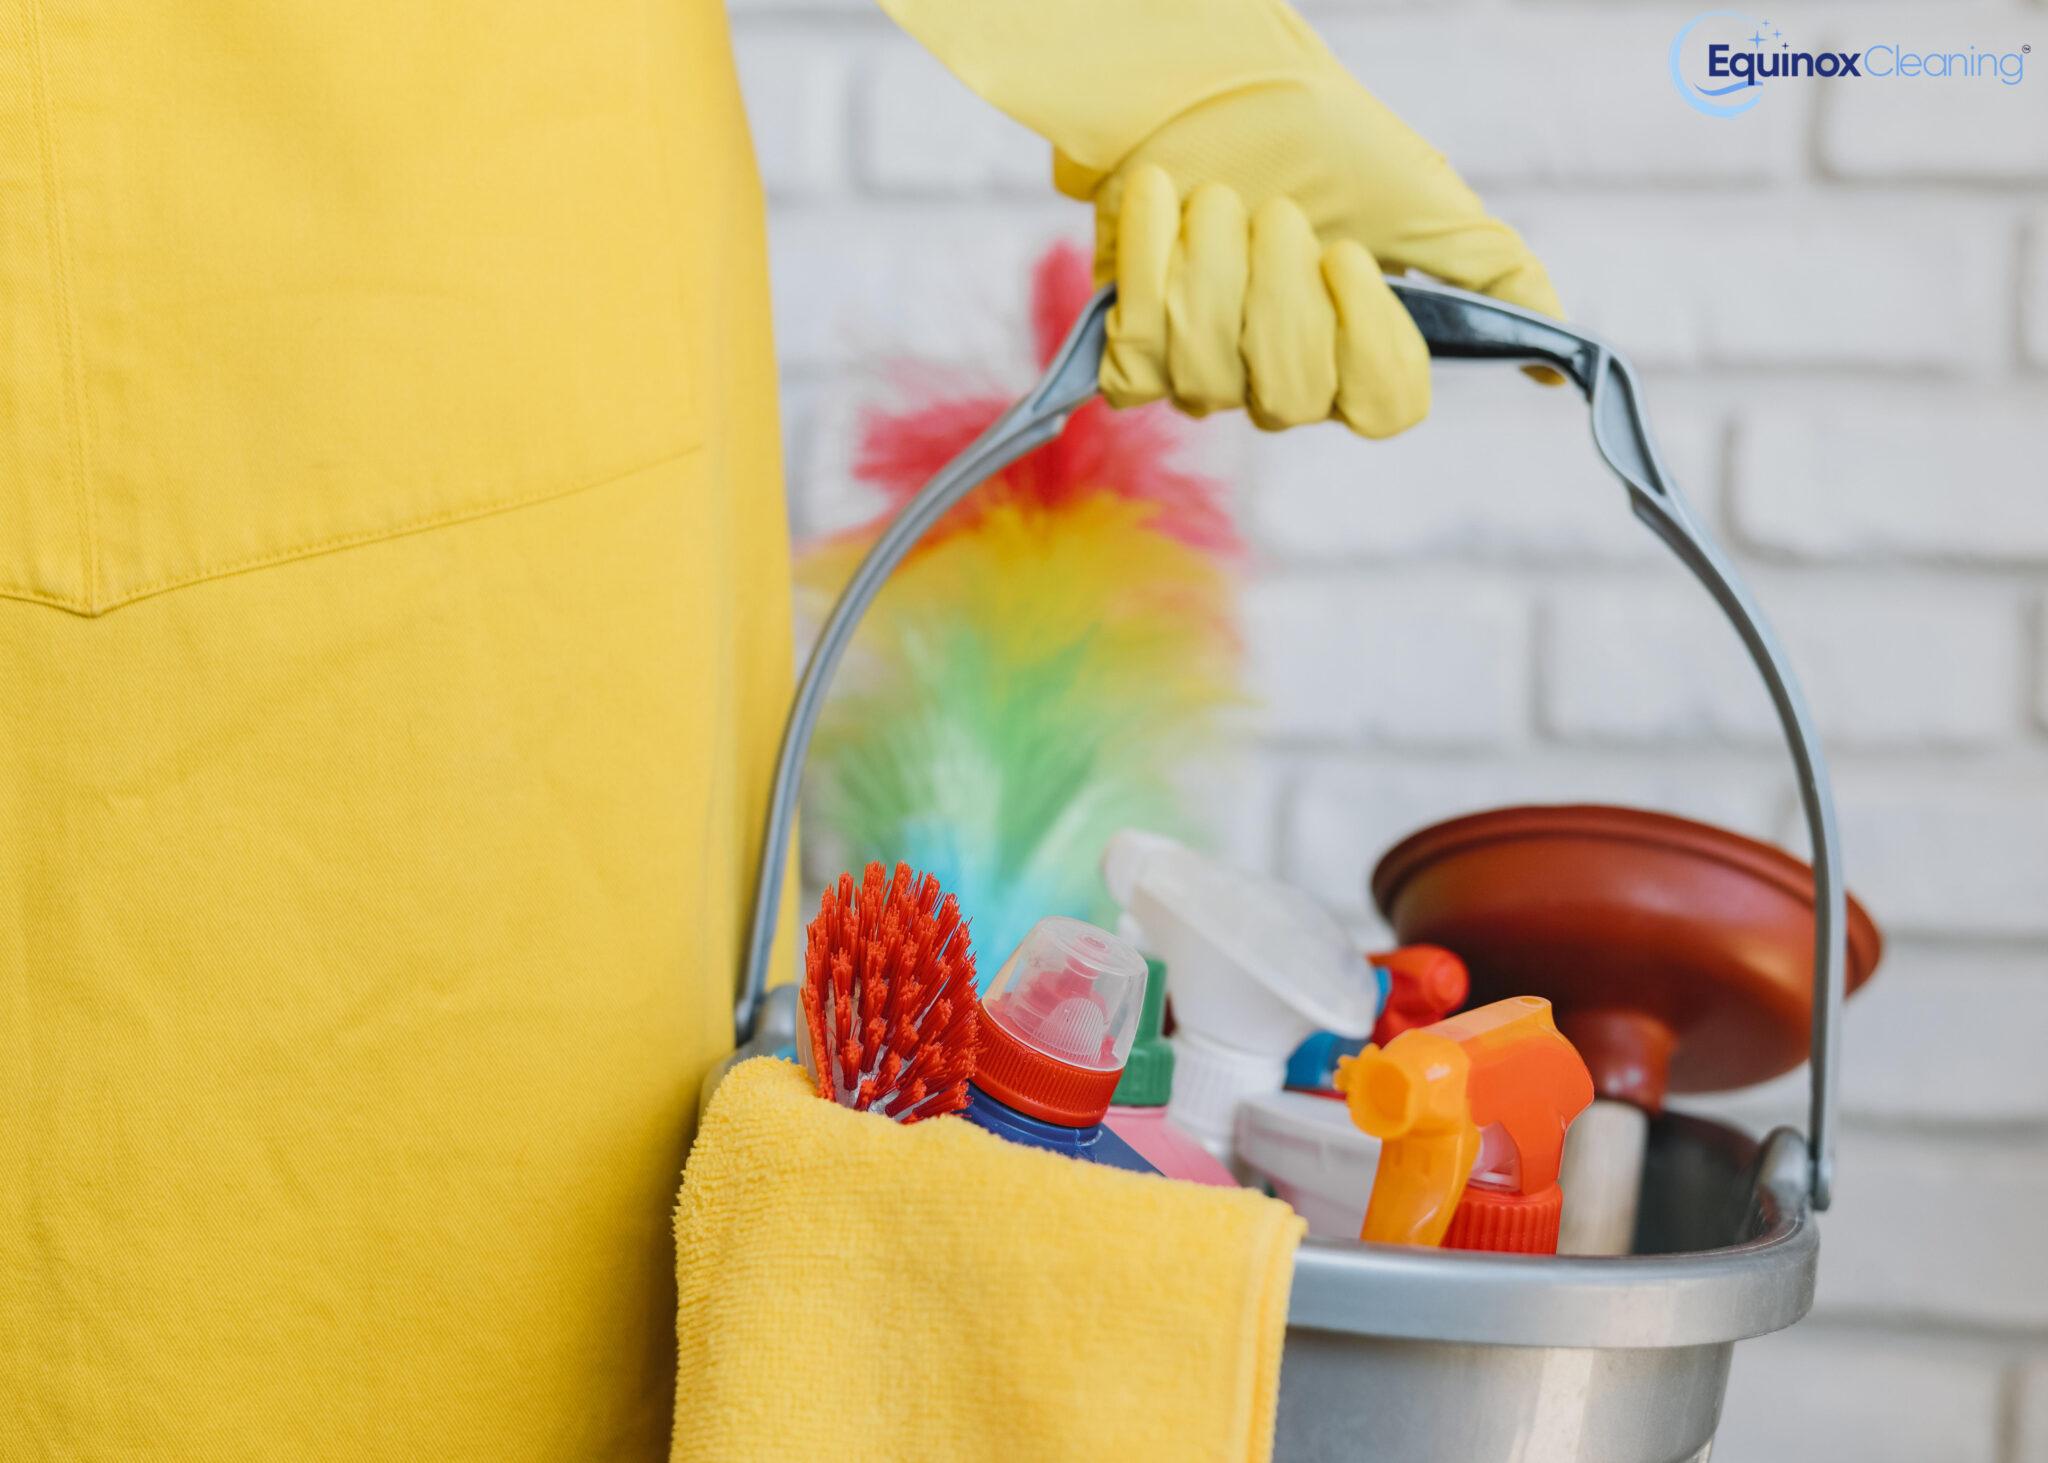 Equinox cleaning | staff